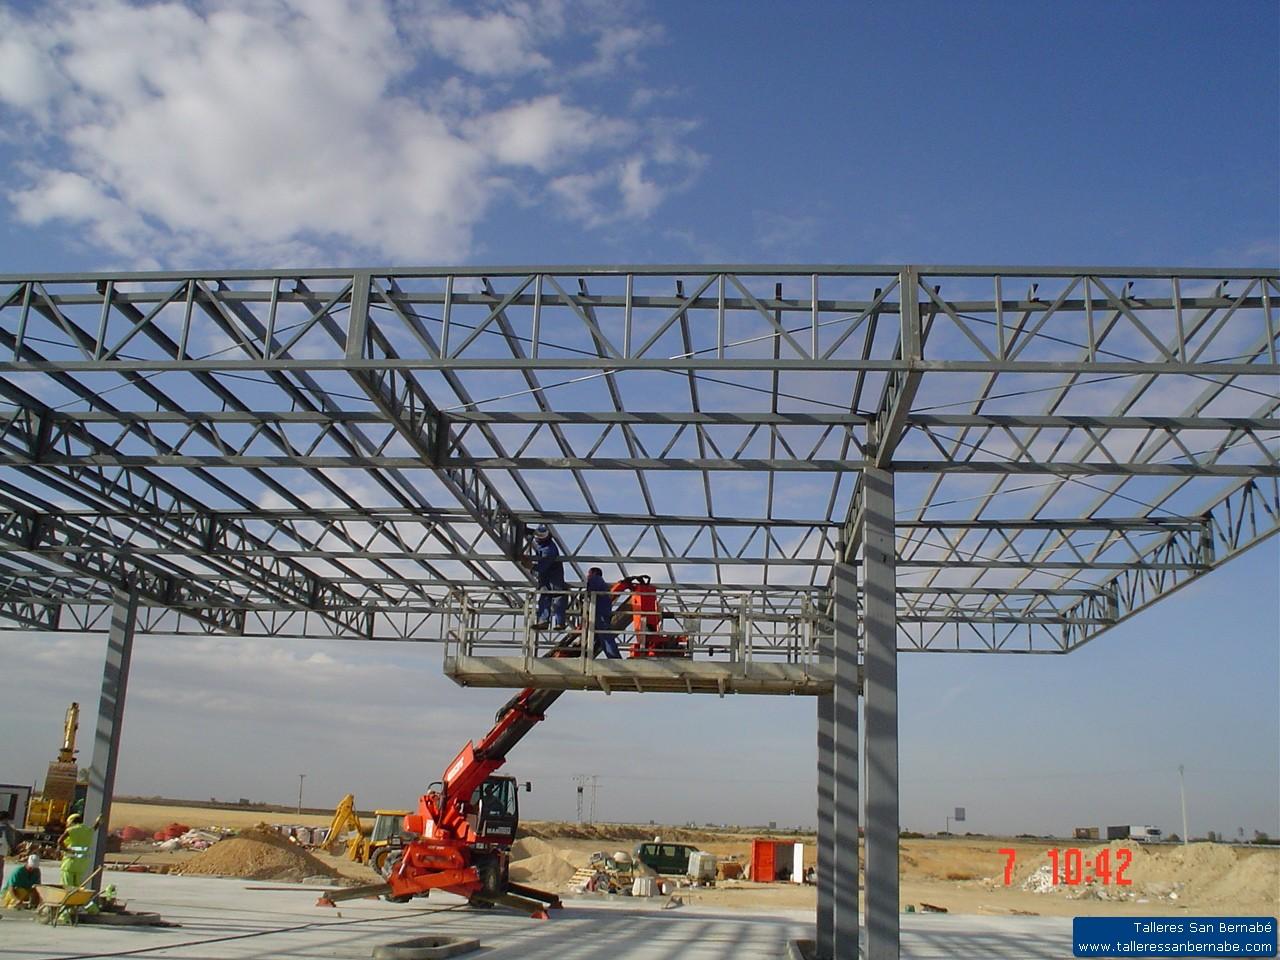 Estructuras metalicas estructuras metalicas - Fotos estructuras metalicas ...